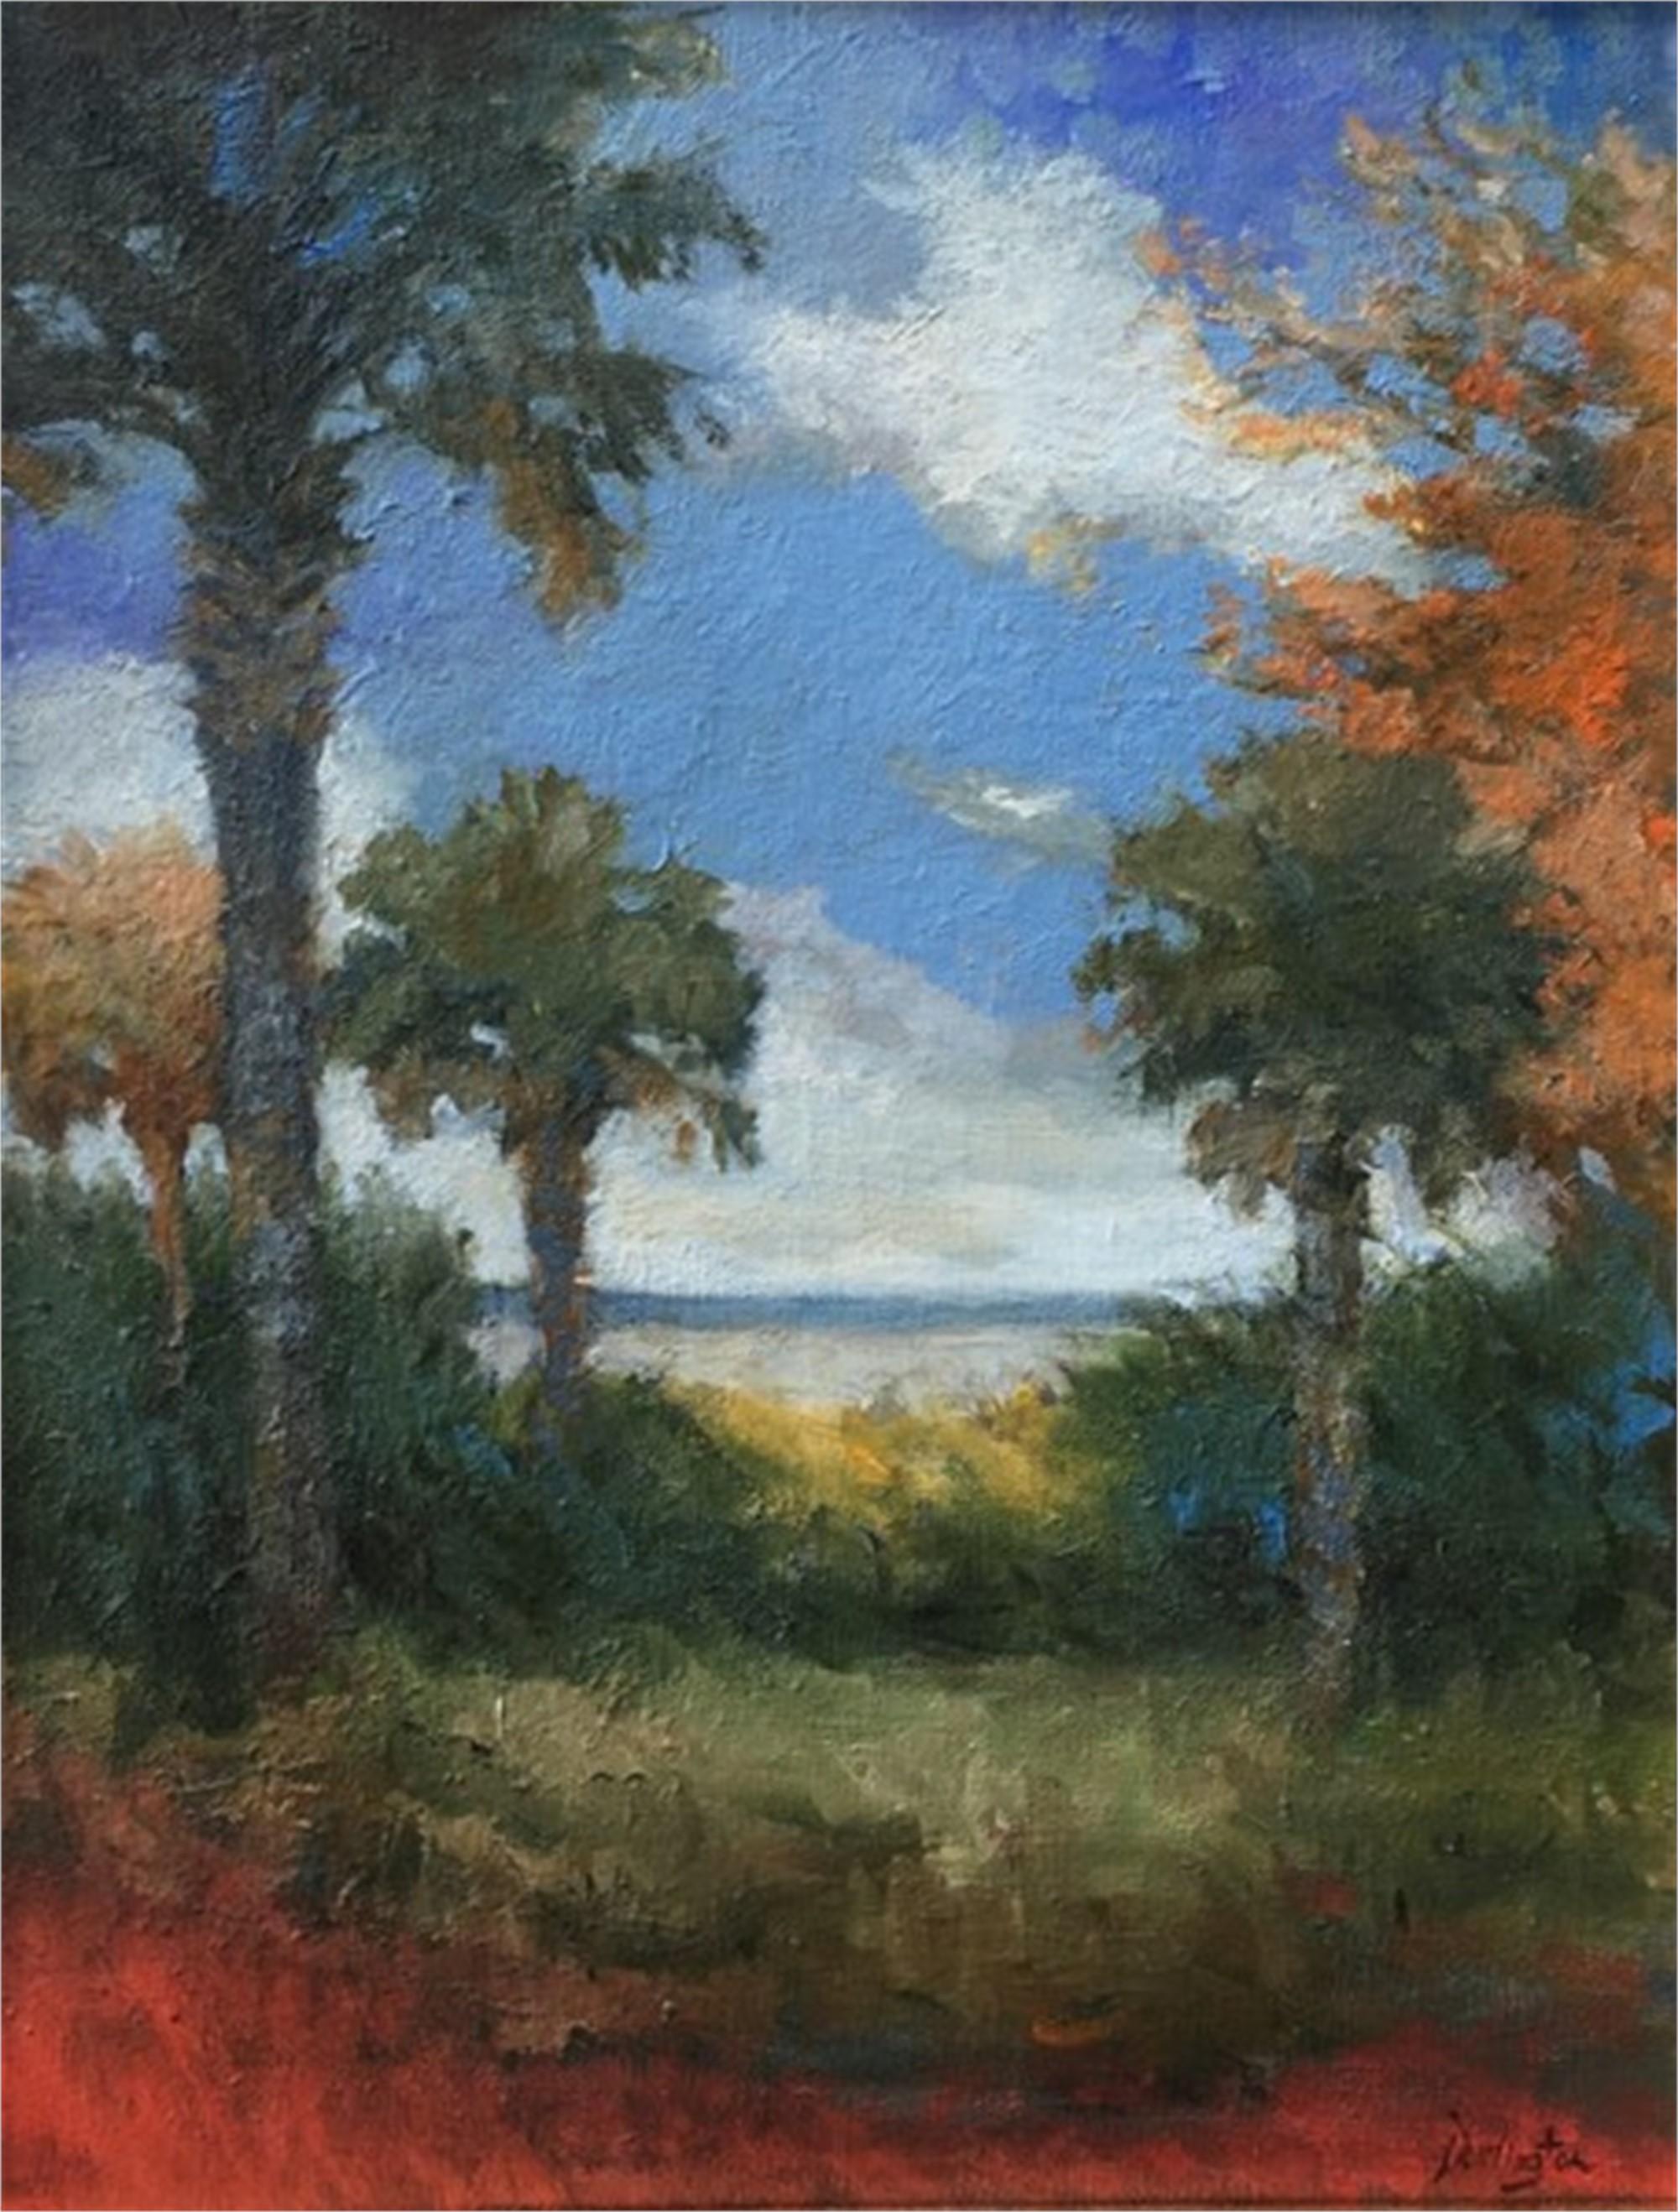 Quiet Splendor by Jim Darlington